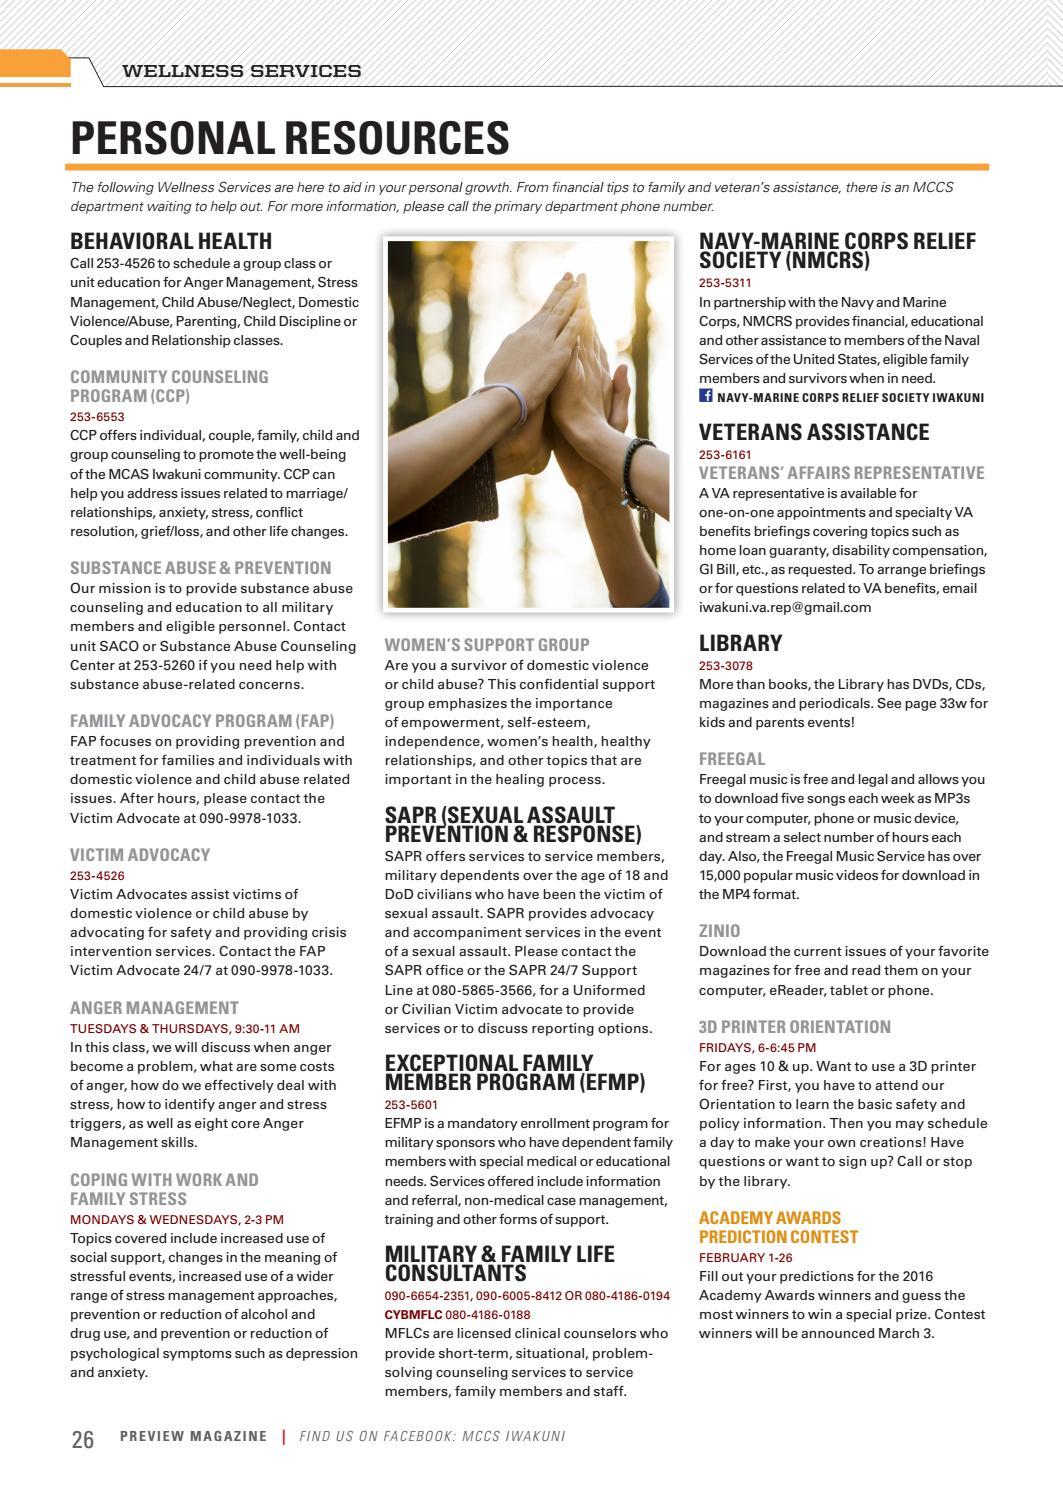 Preview Magazine - February 2017 by MCCS Iwakuni - issuu